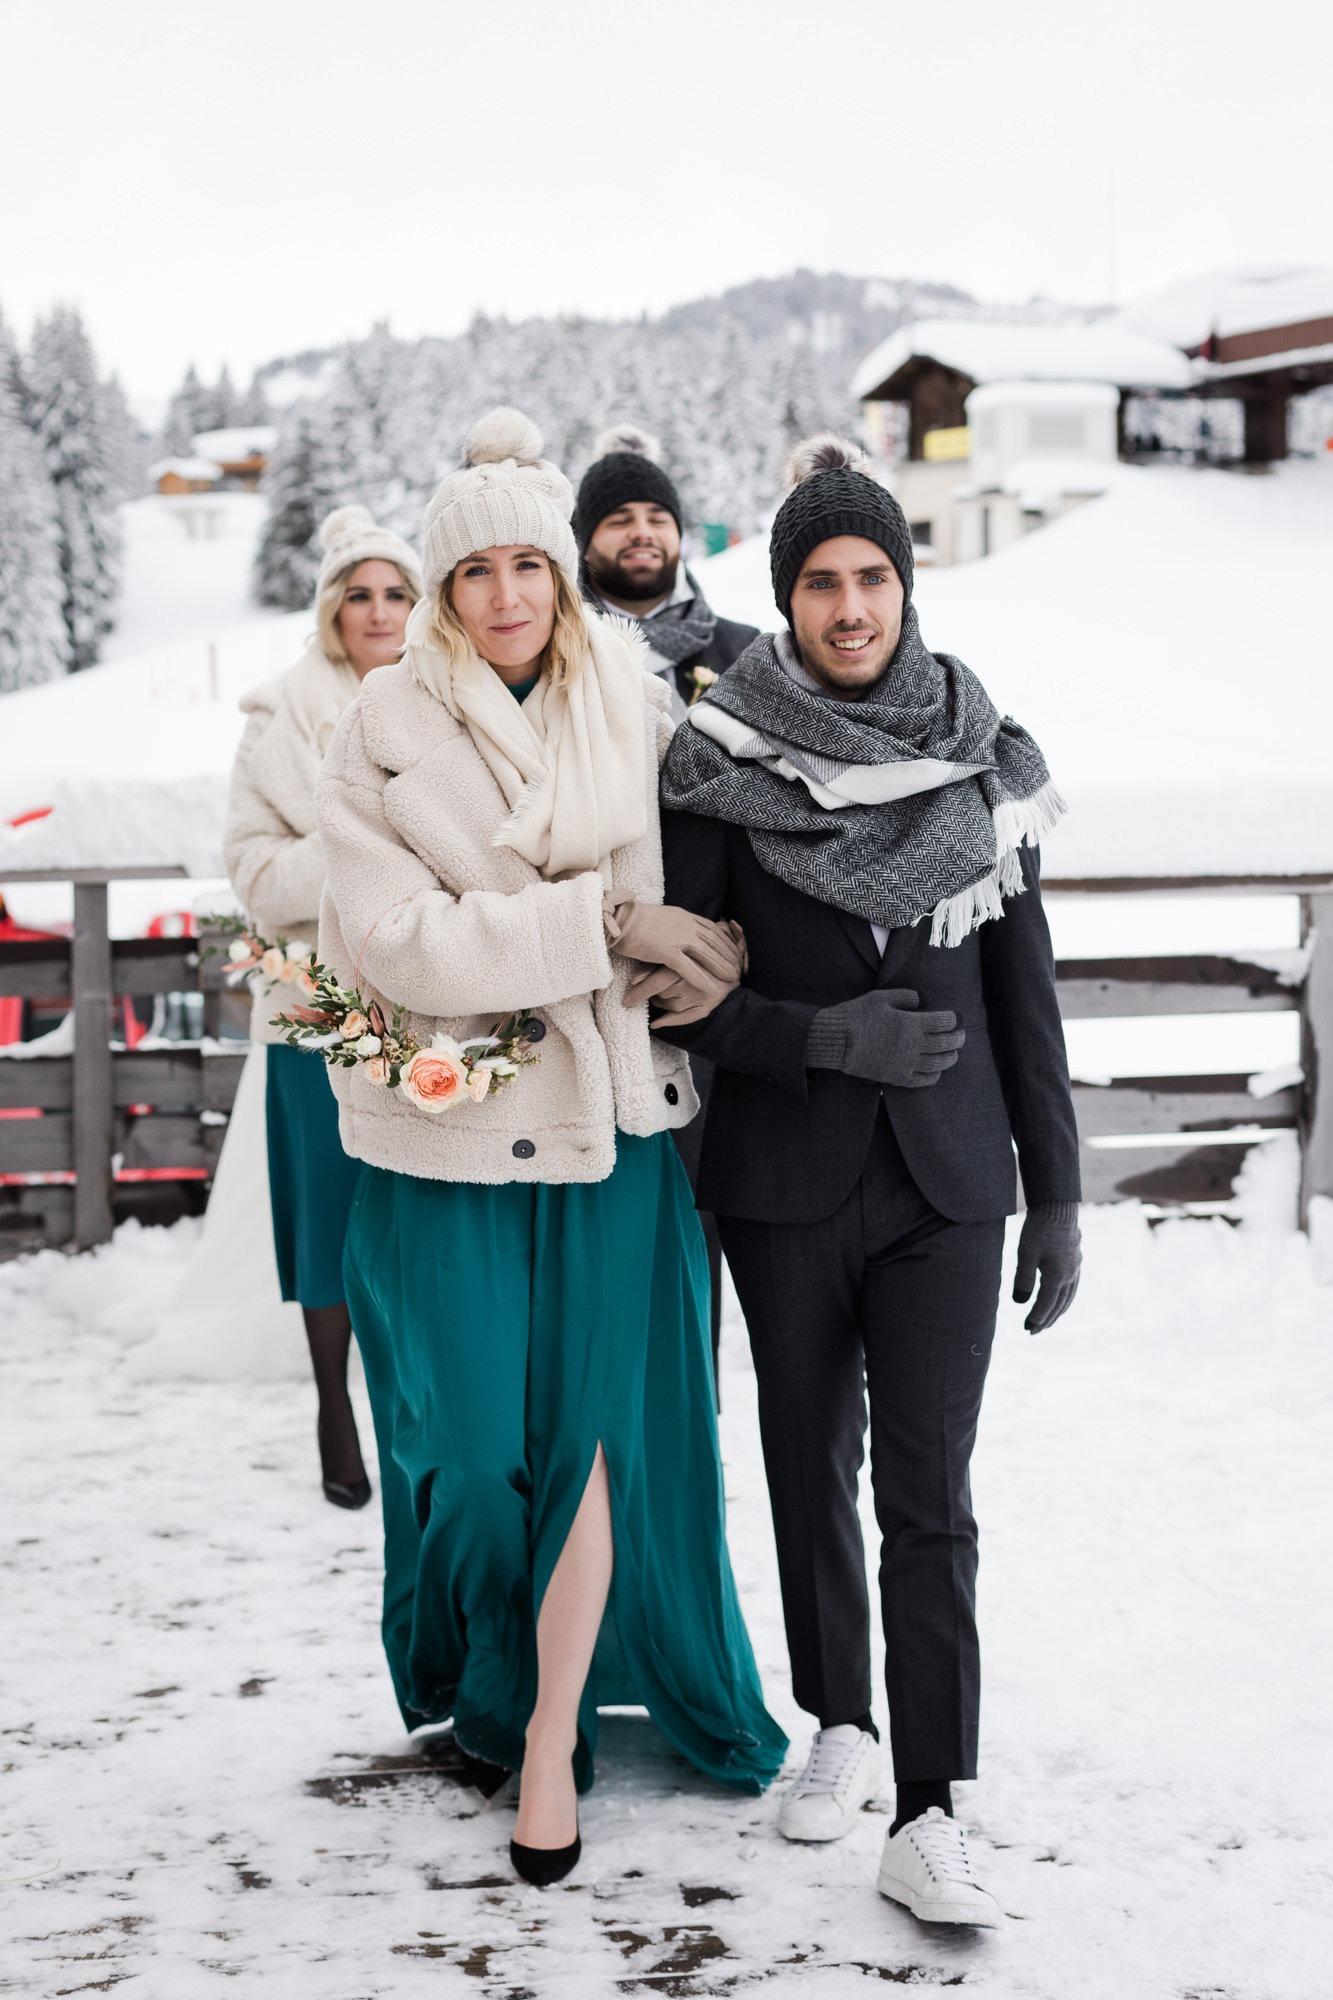 fugue amoureuse - mariage hiver - wedding planner lyon les moments m